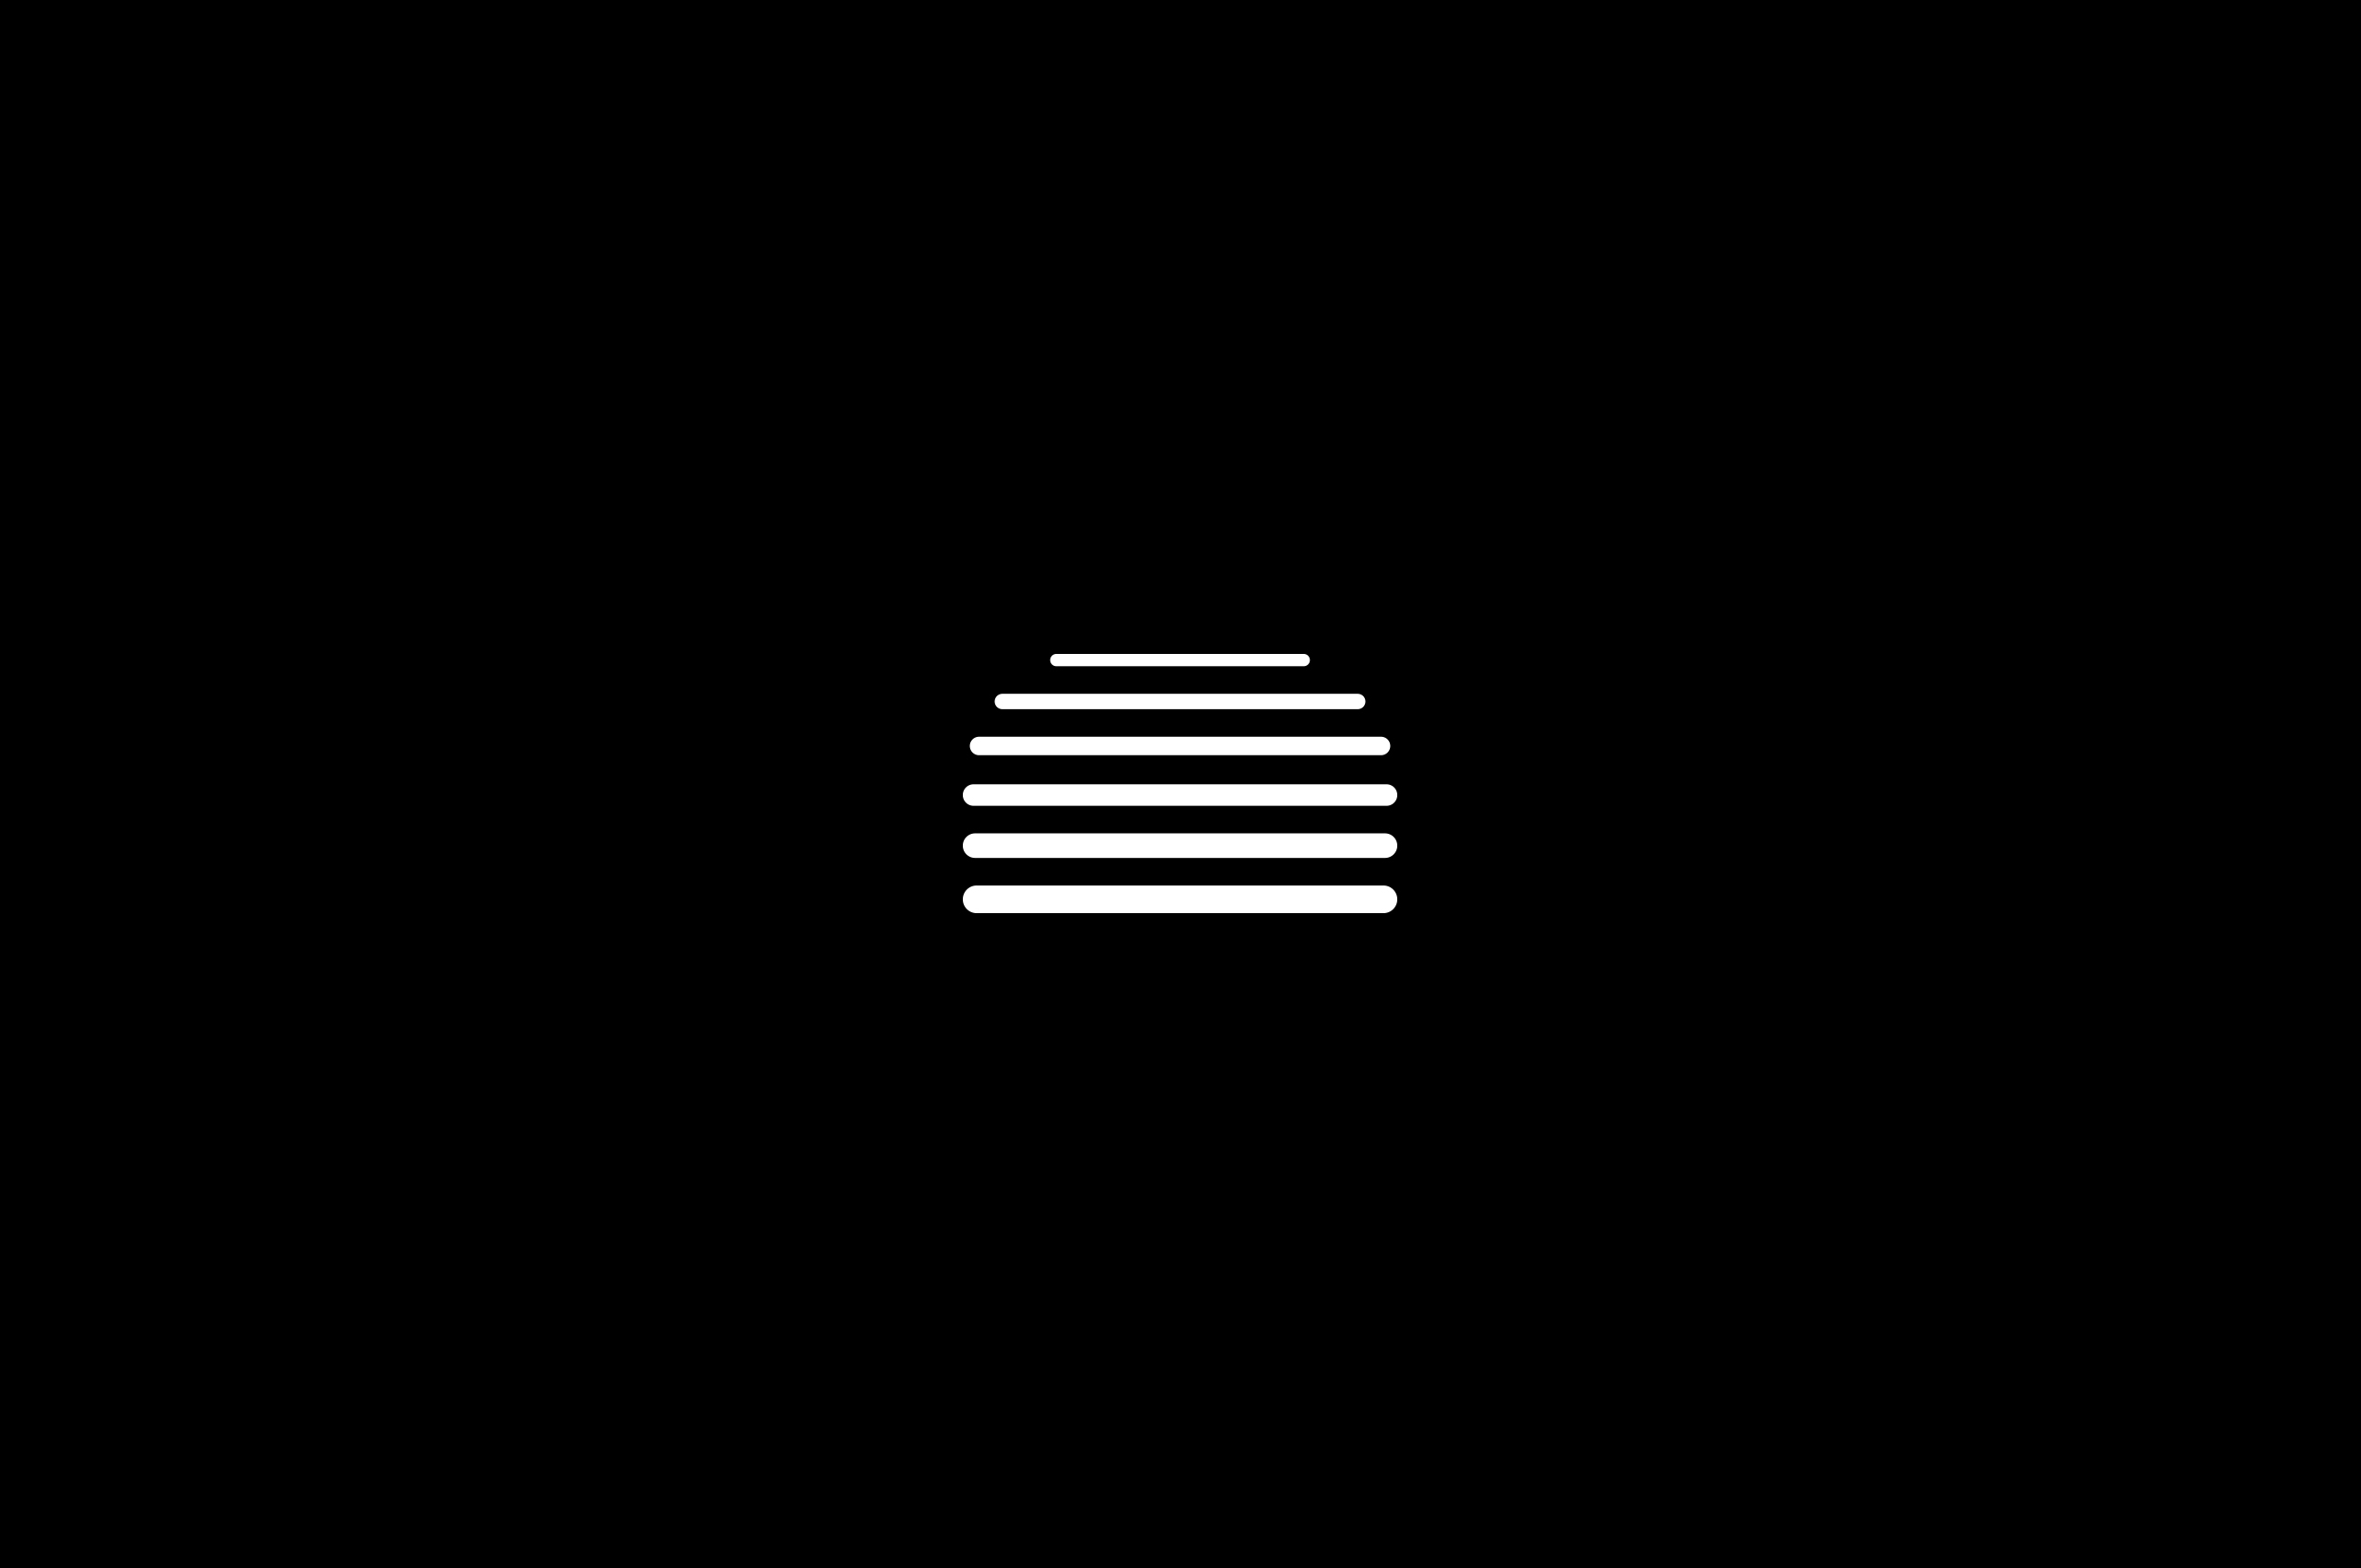 logo-17-black